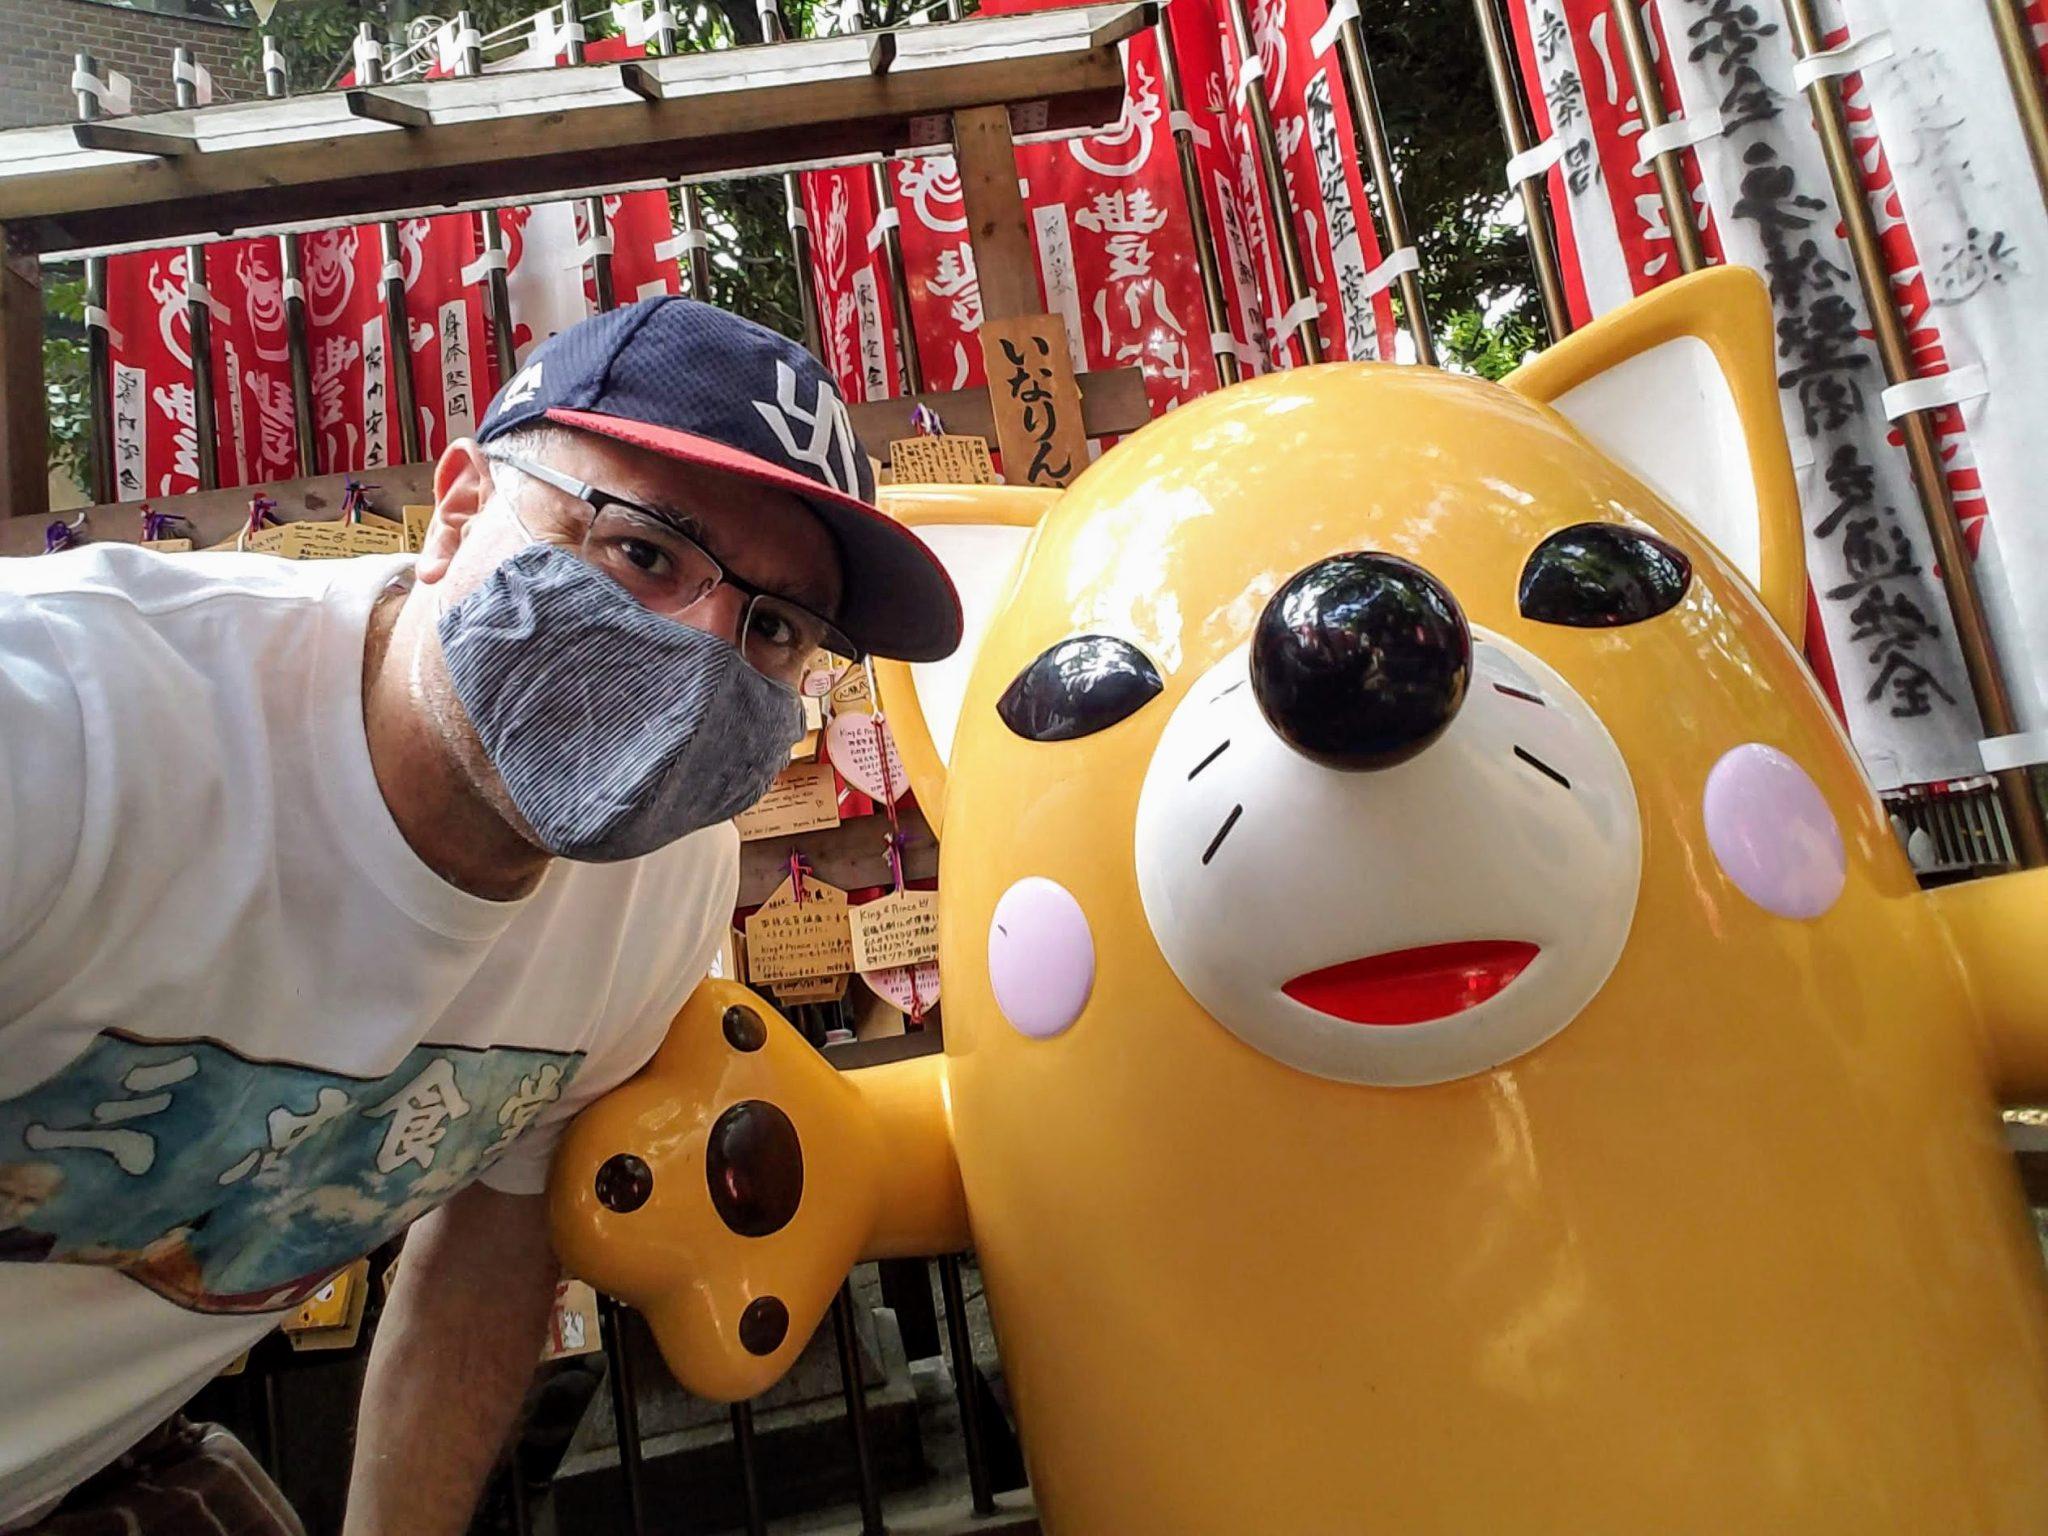 Inarin, the mascot of Toyokoawa Inari Tokyo Betsuin in Akasaka, Tokyo